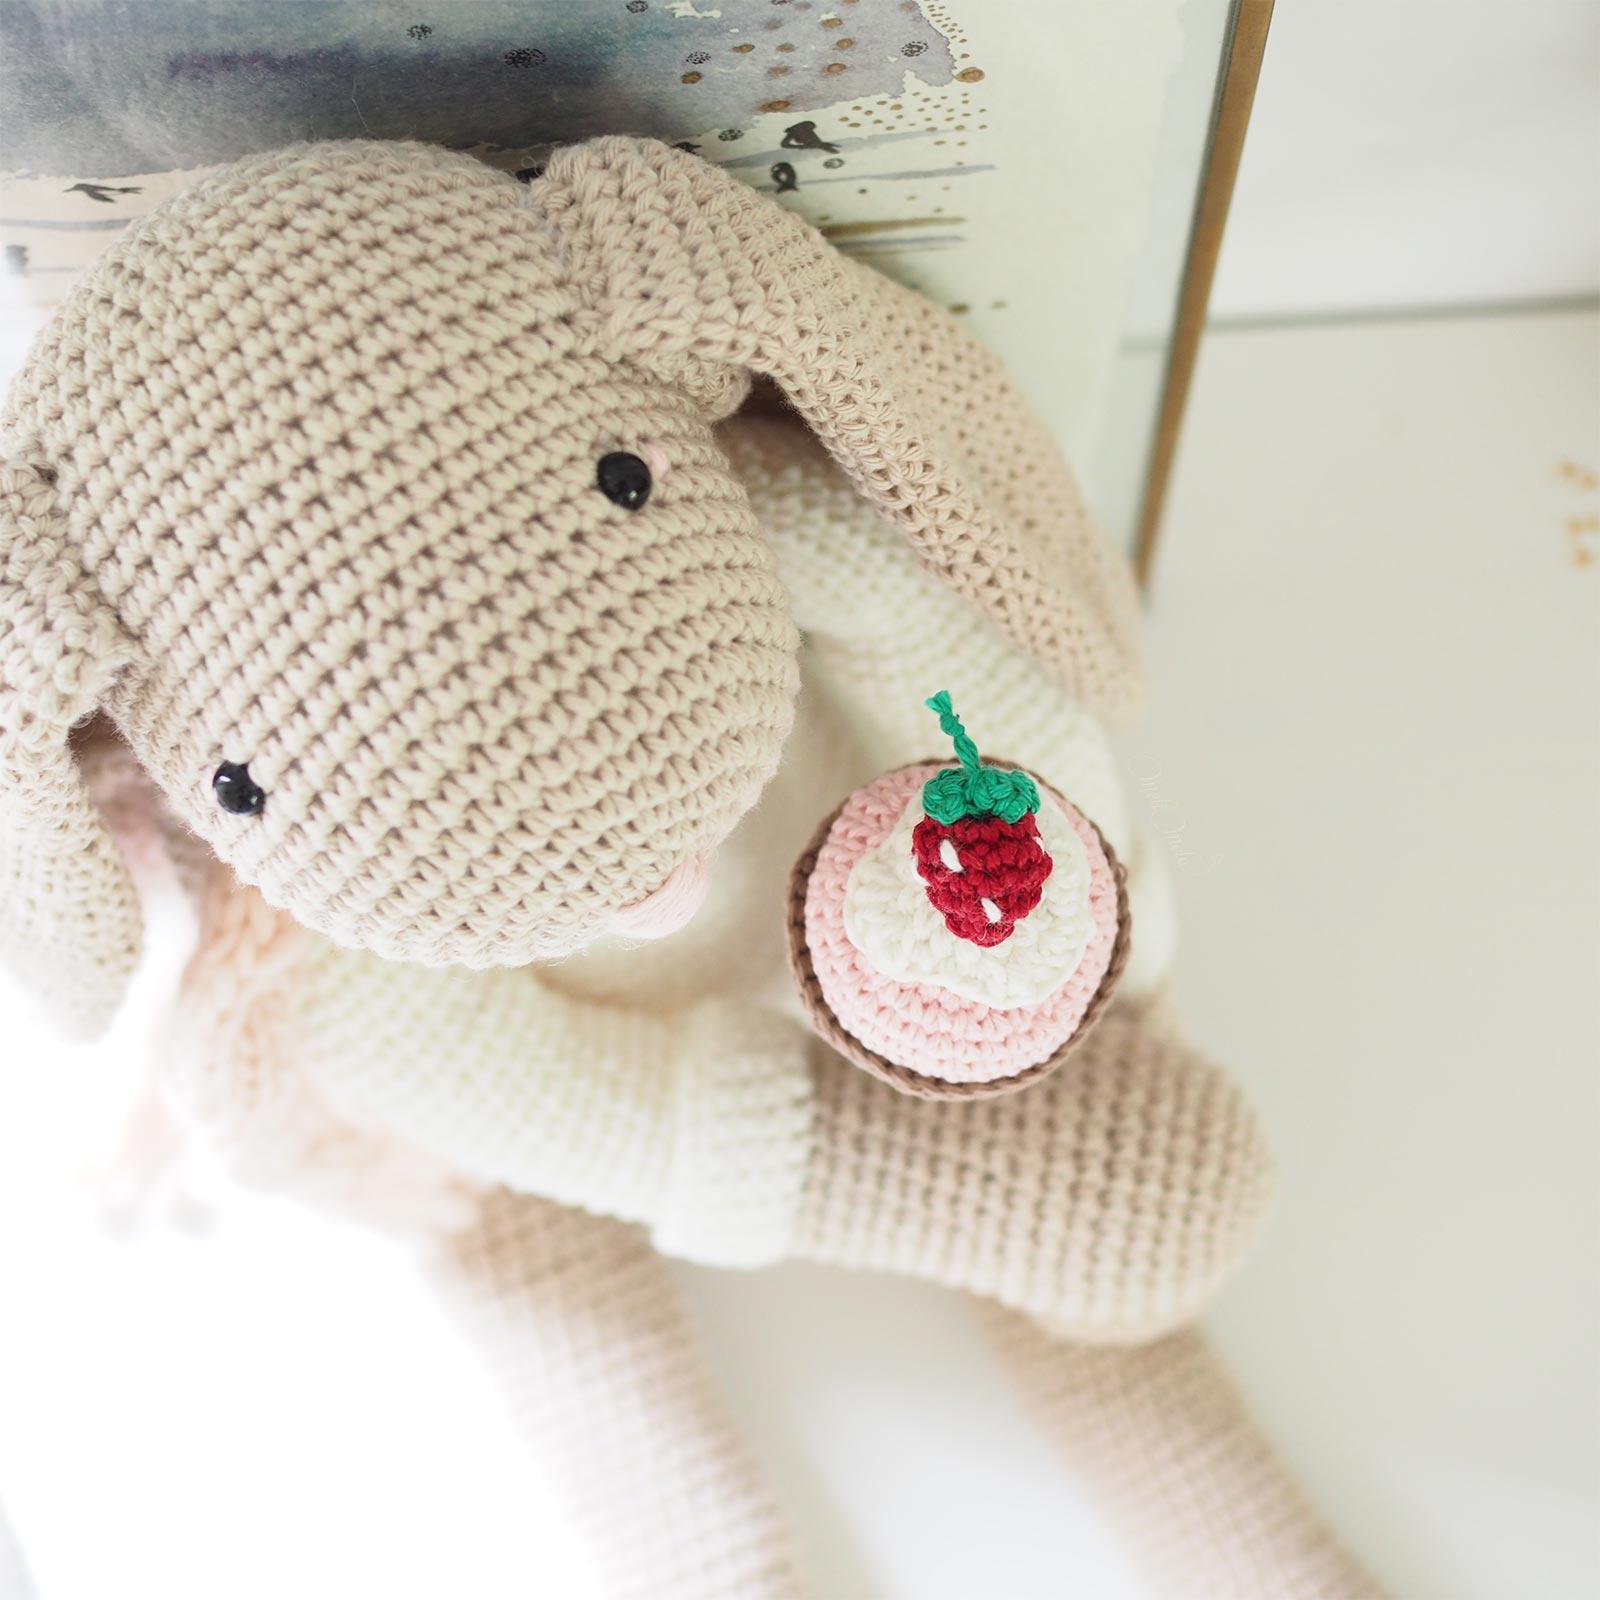 lapin doudou amigurumi crochet glace coton Ricorumi Boutique MeliMelo